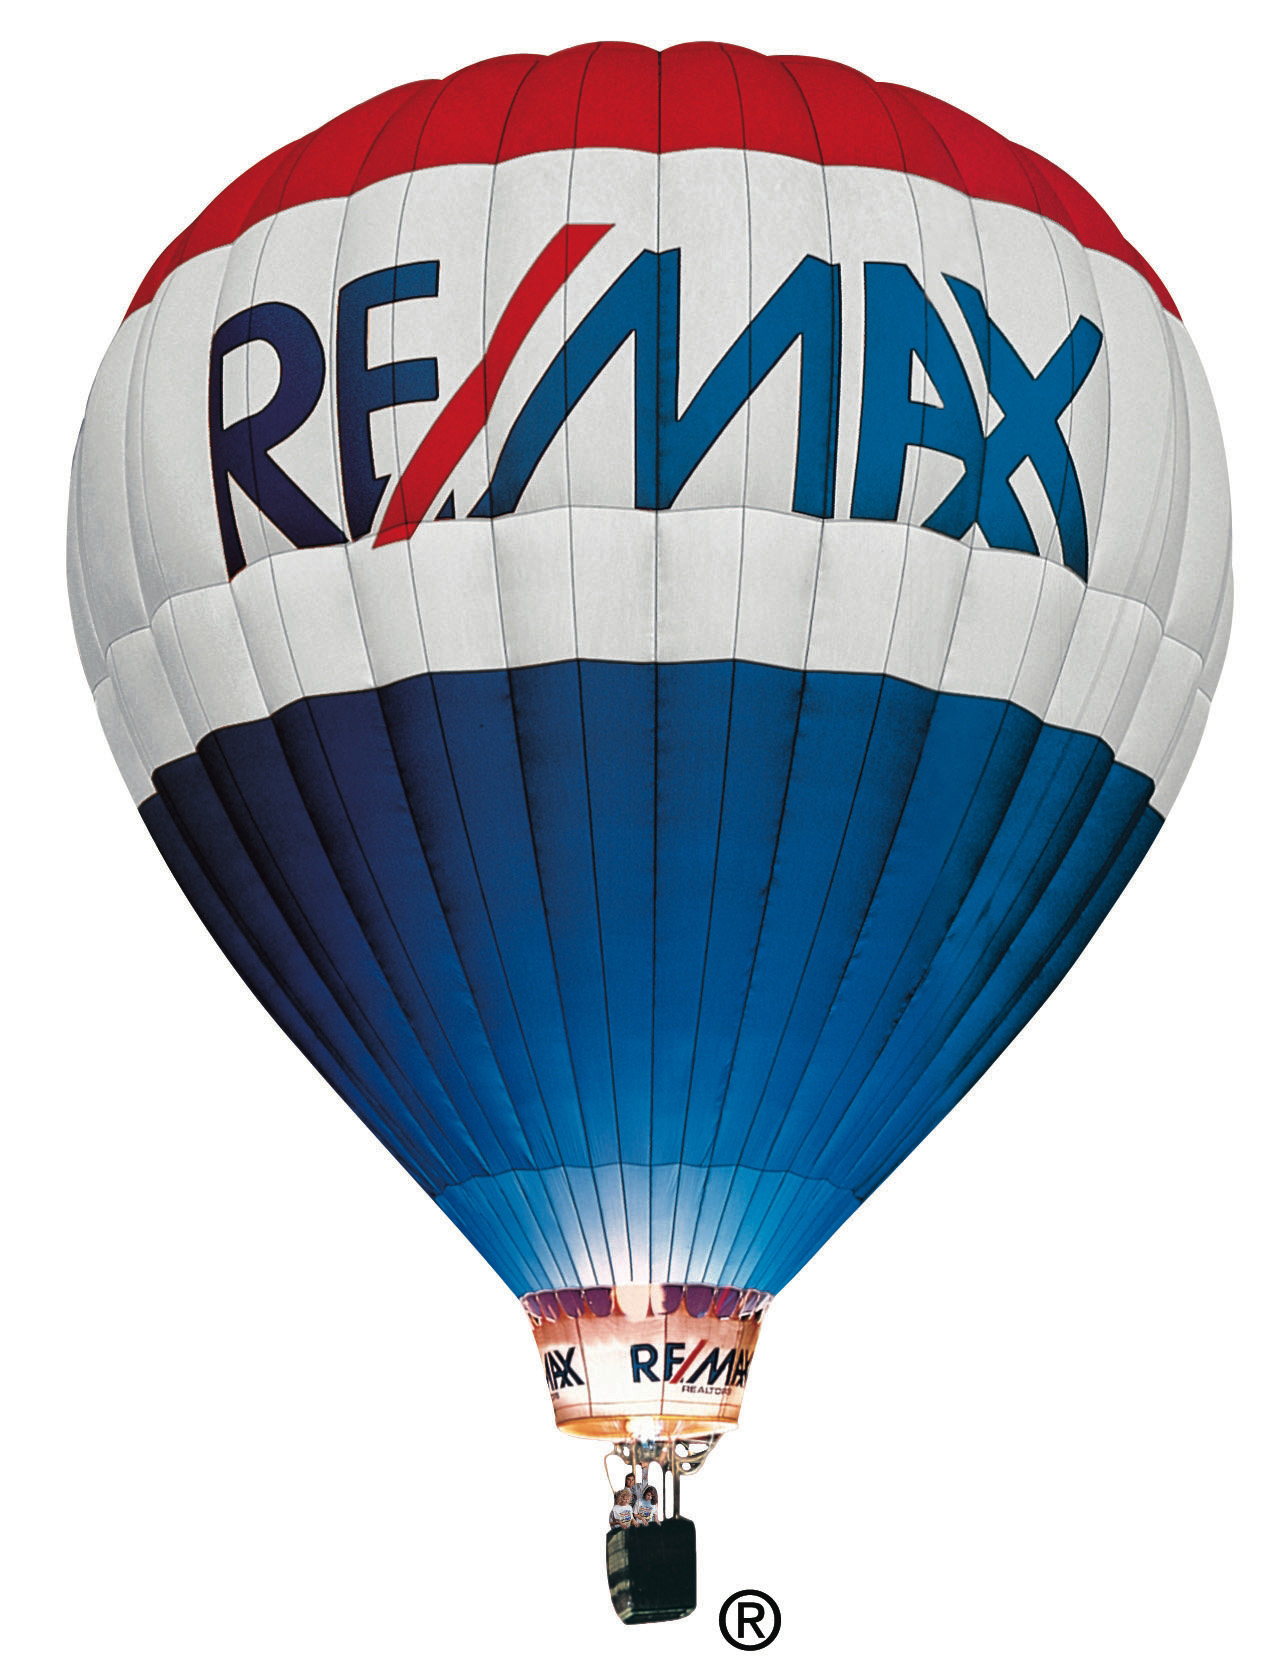 REMAX Creative Realty/Bobbie Johnson